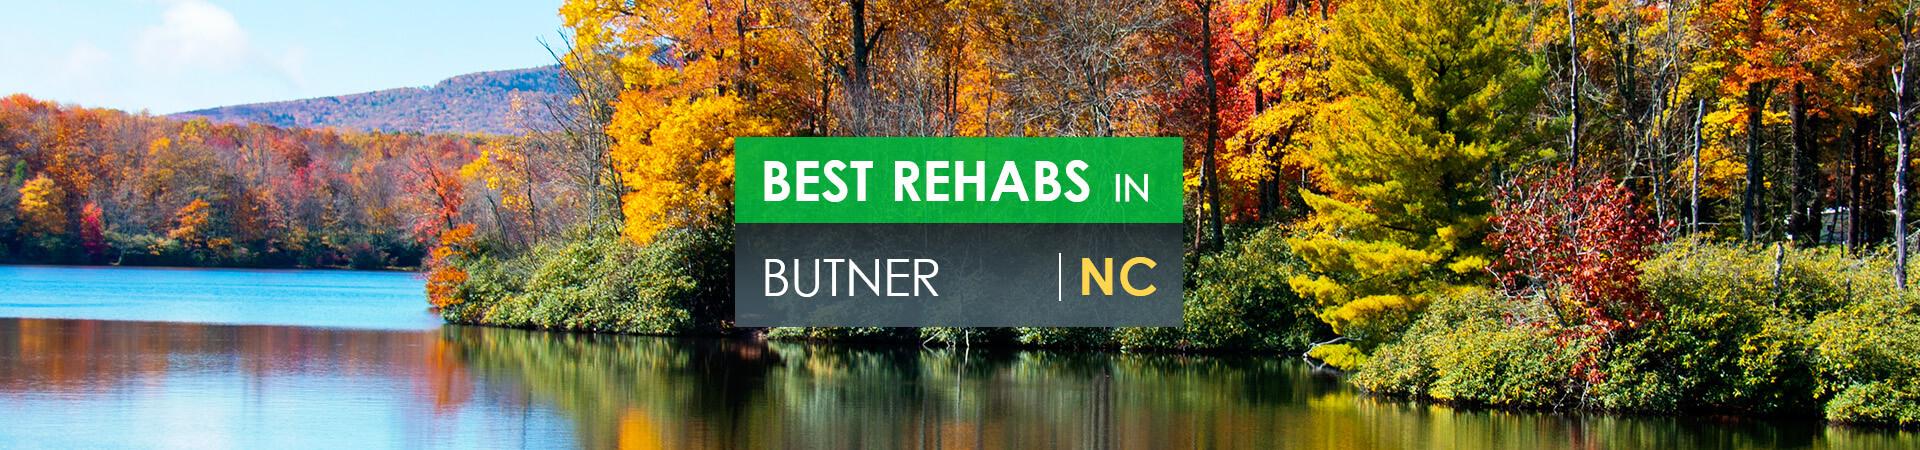 Best rehabs in Butner, NC